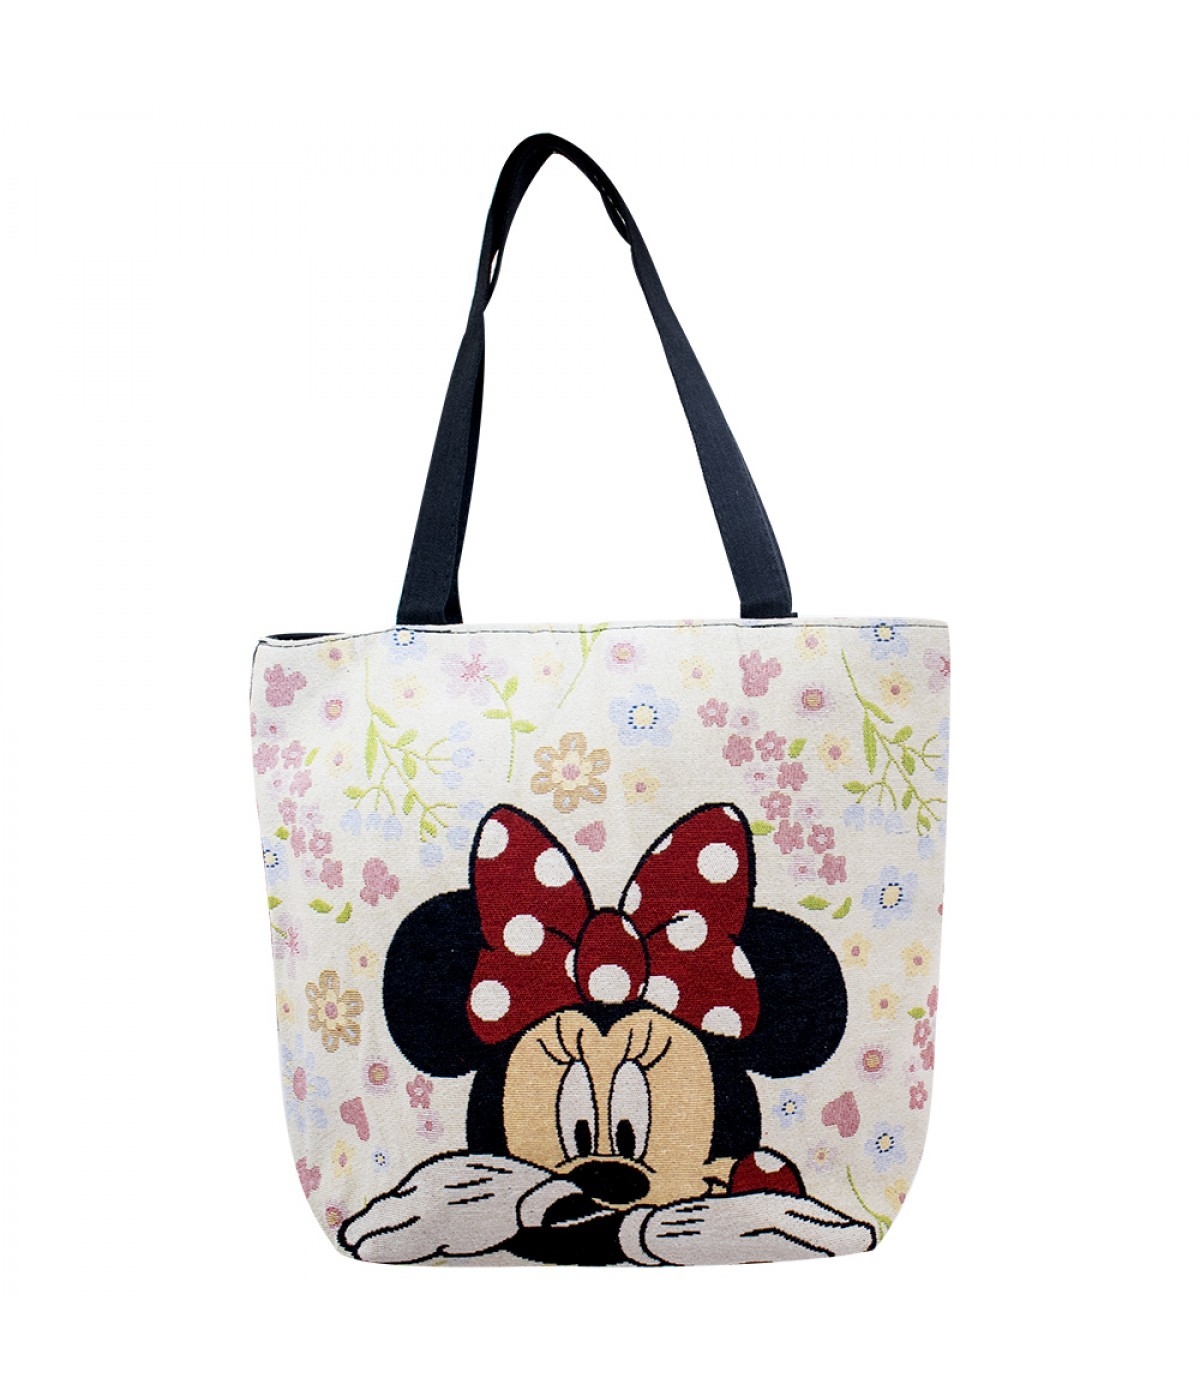 Bolsa Minnie tecido - Disney